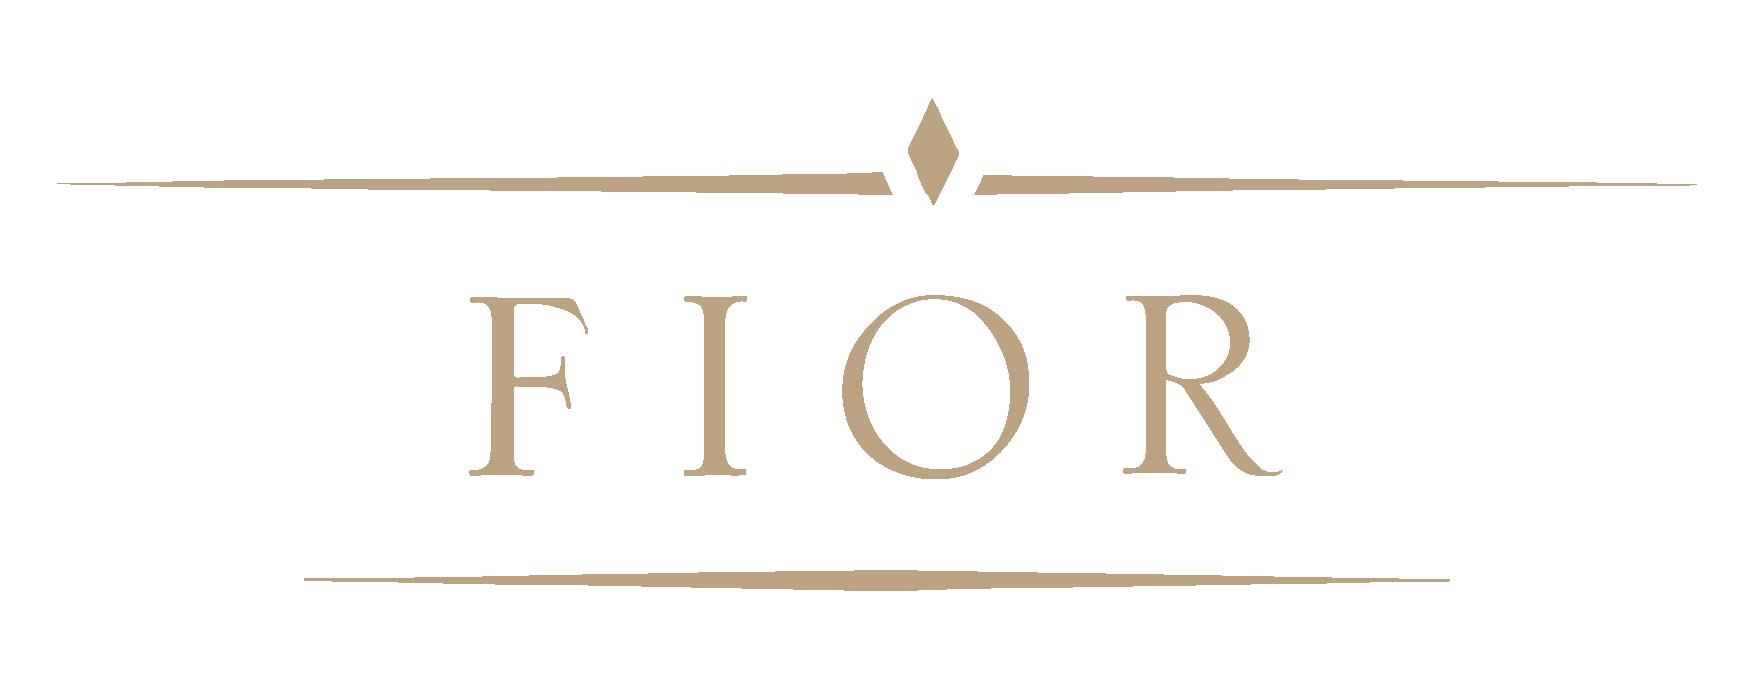 Fior-logo-01.png